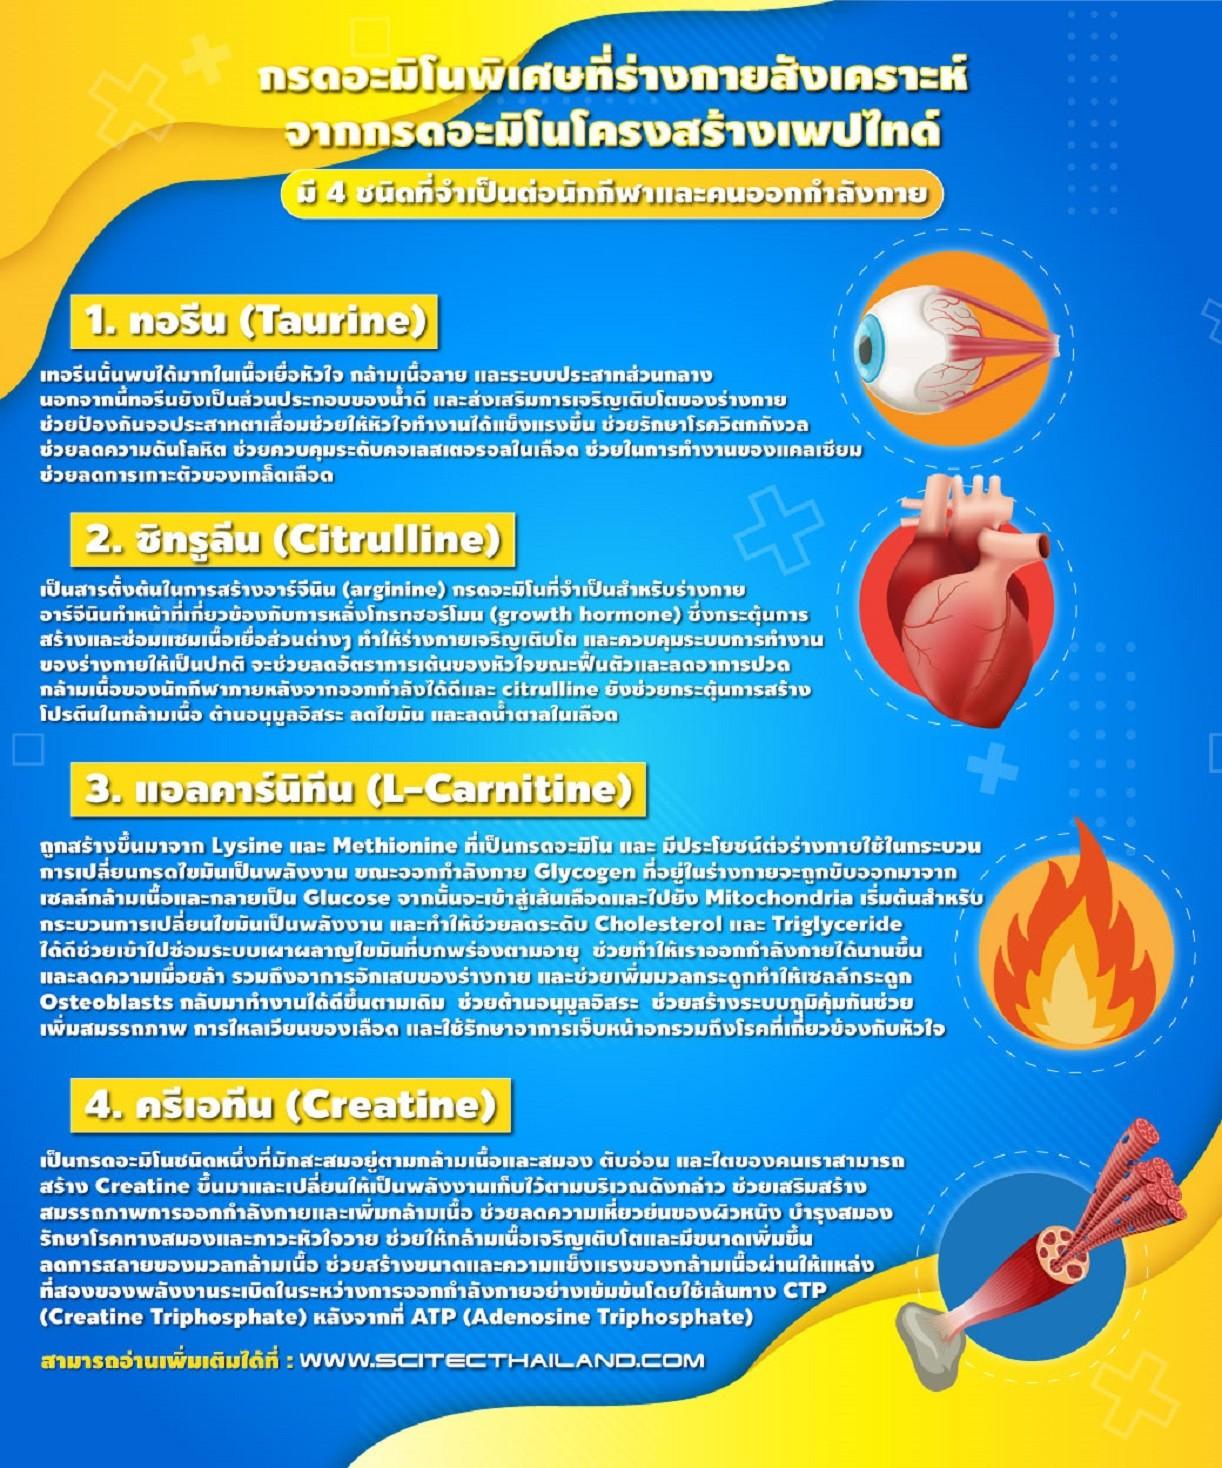 amino-content-bgc-3.jpg